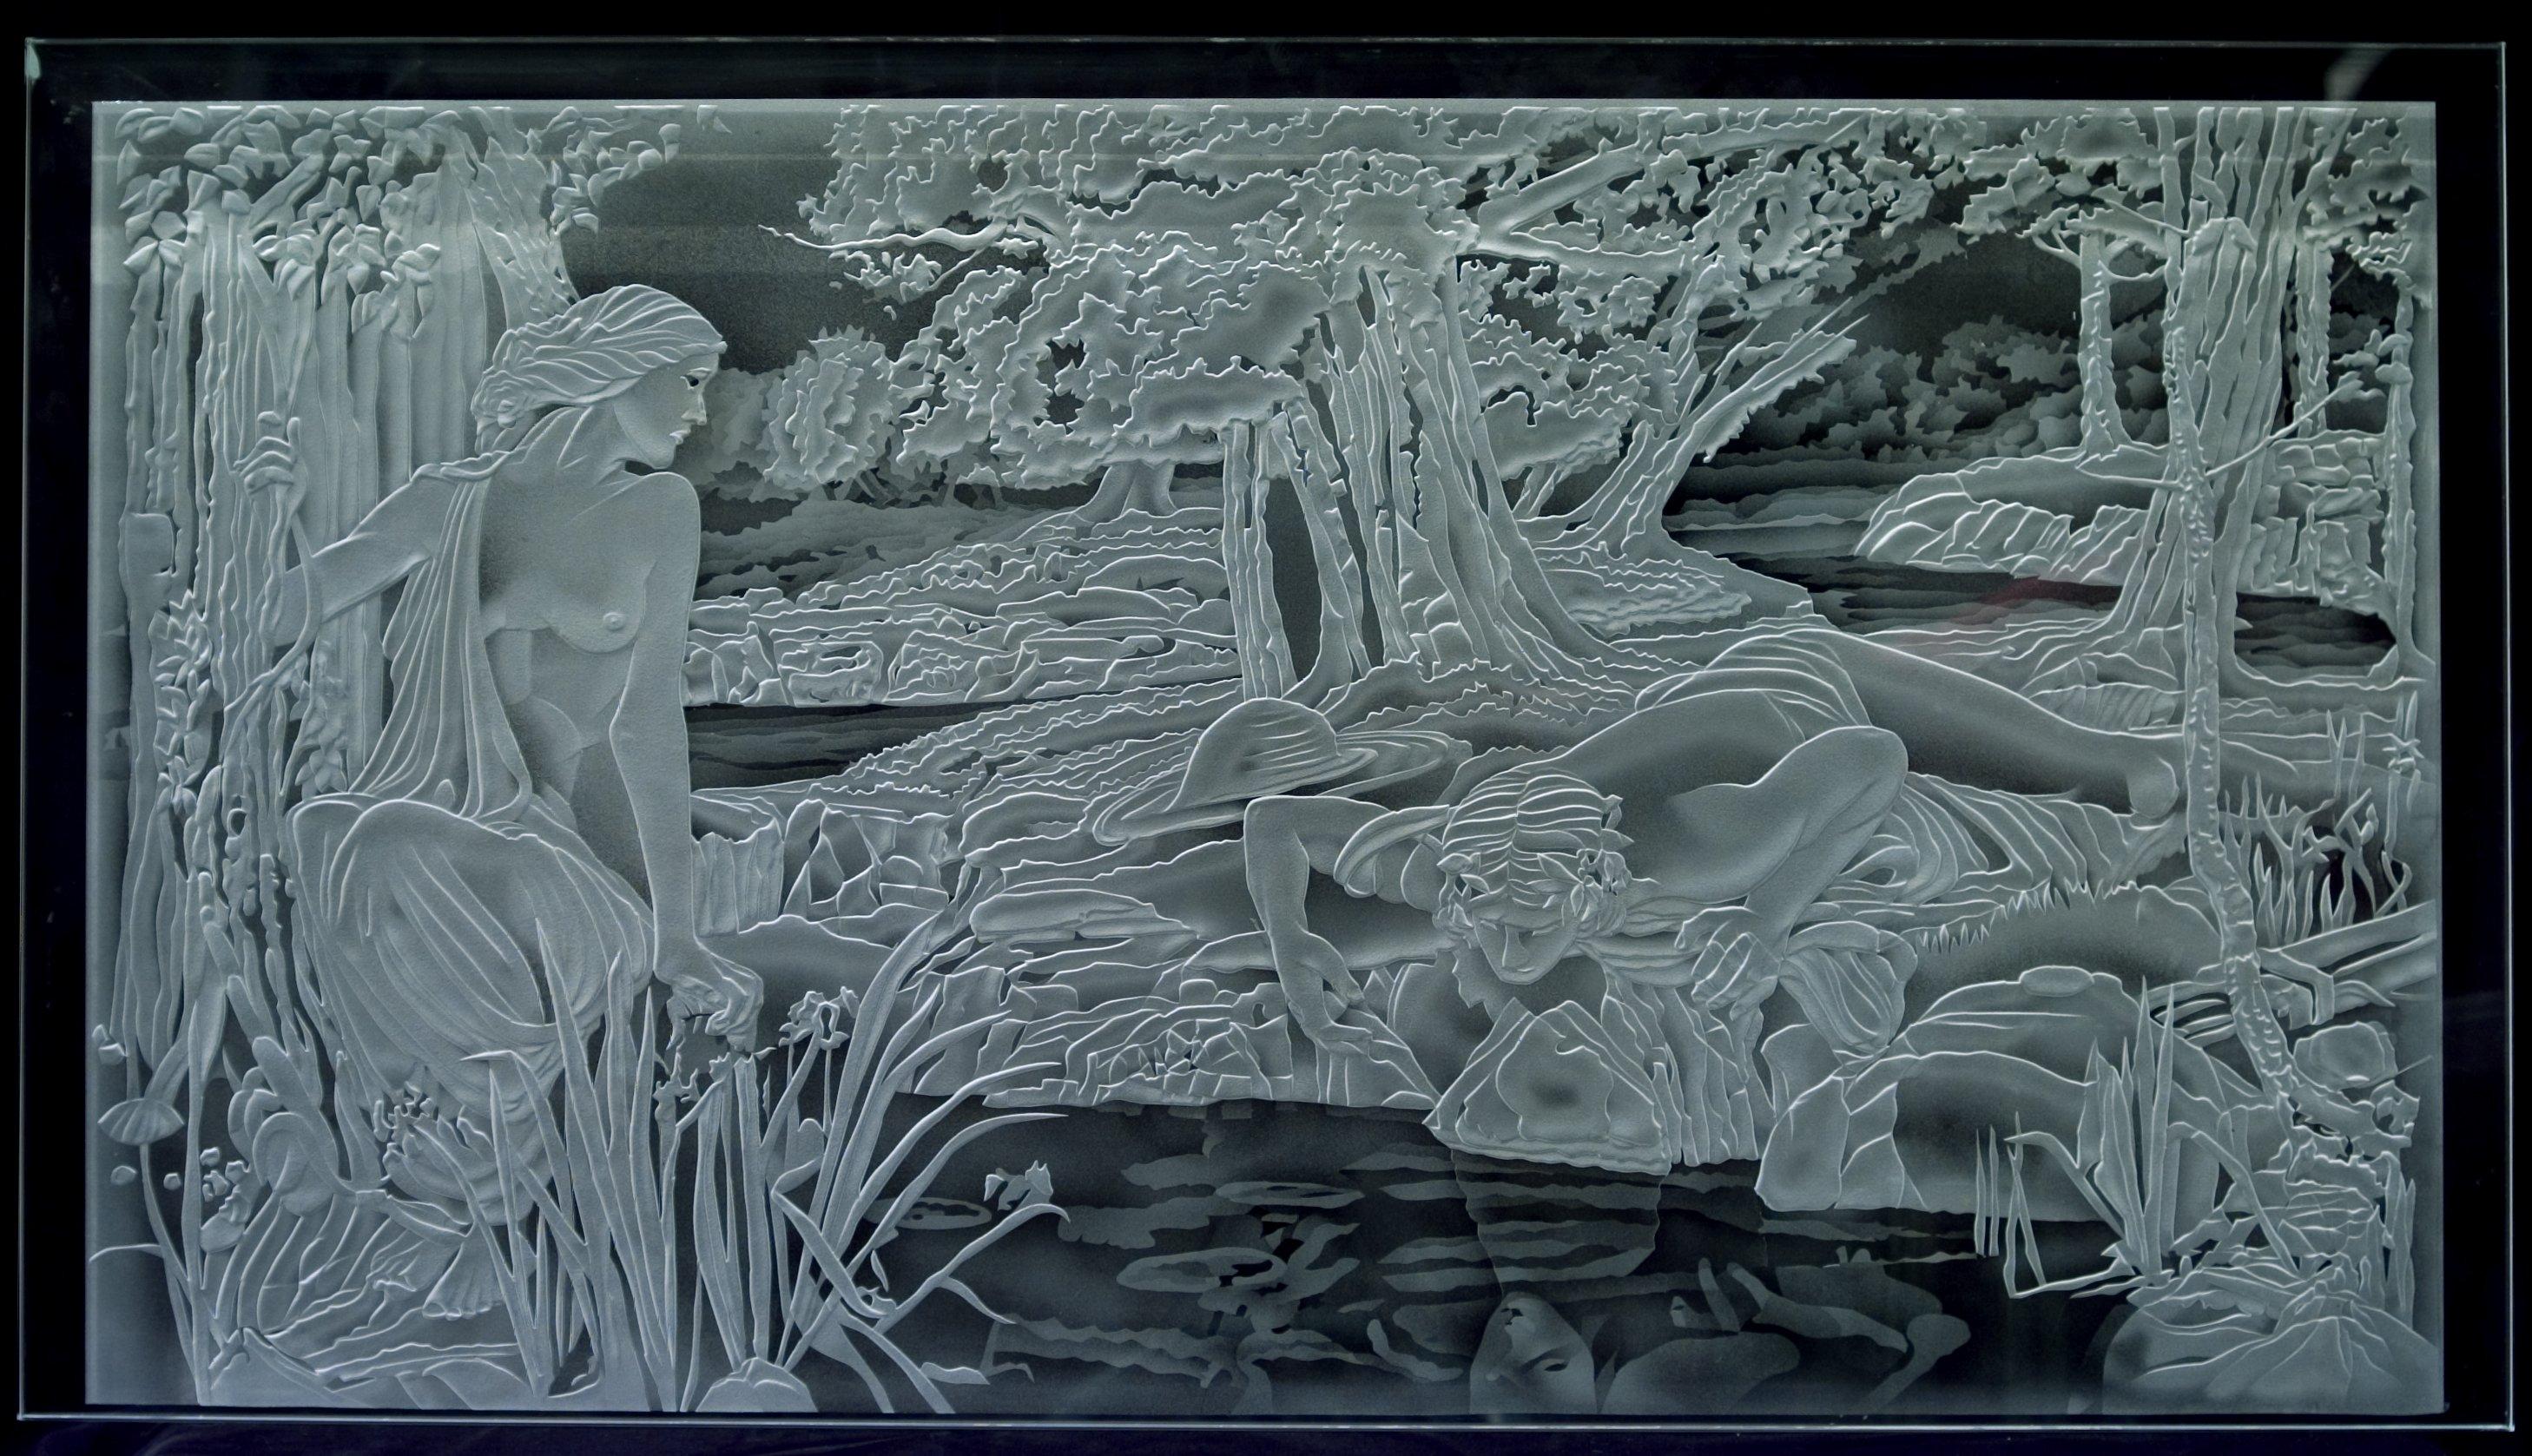 Psychenarcissus Giuseppe Villella Hand Carved Glass 20 X 30 Inches November 20 2019